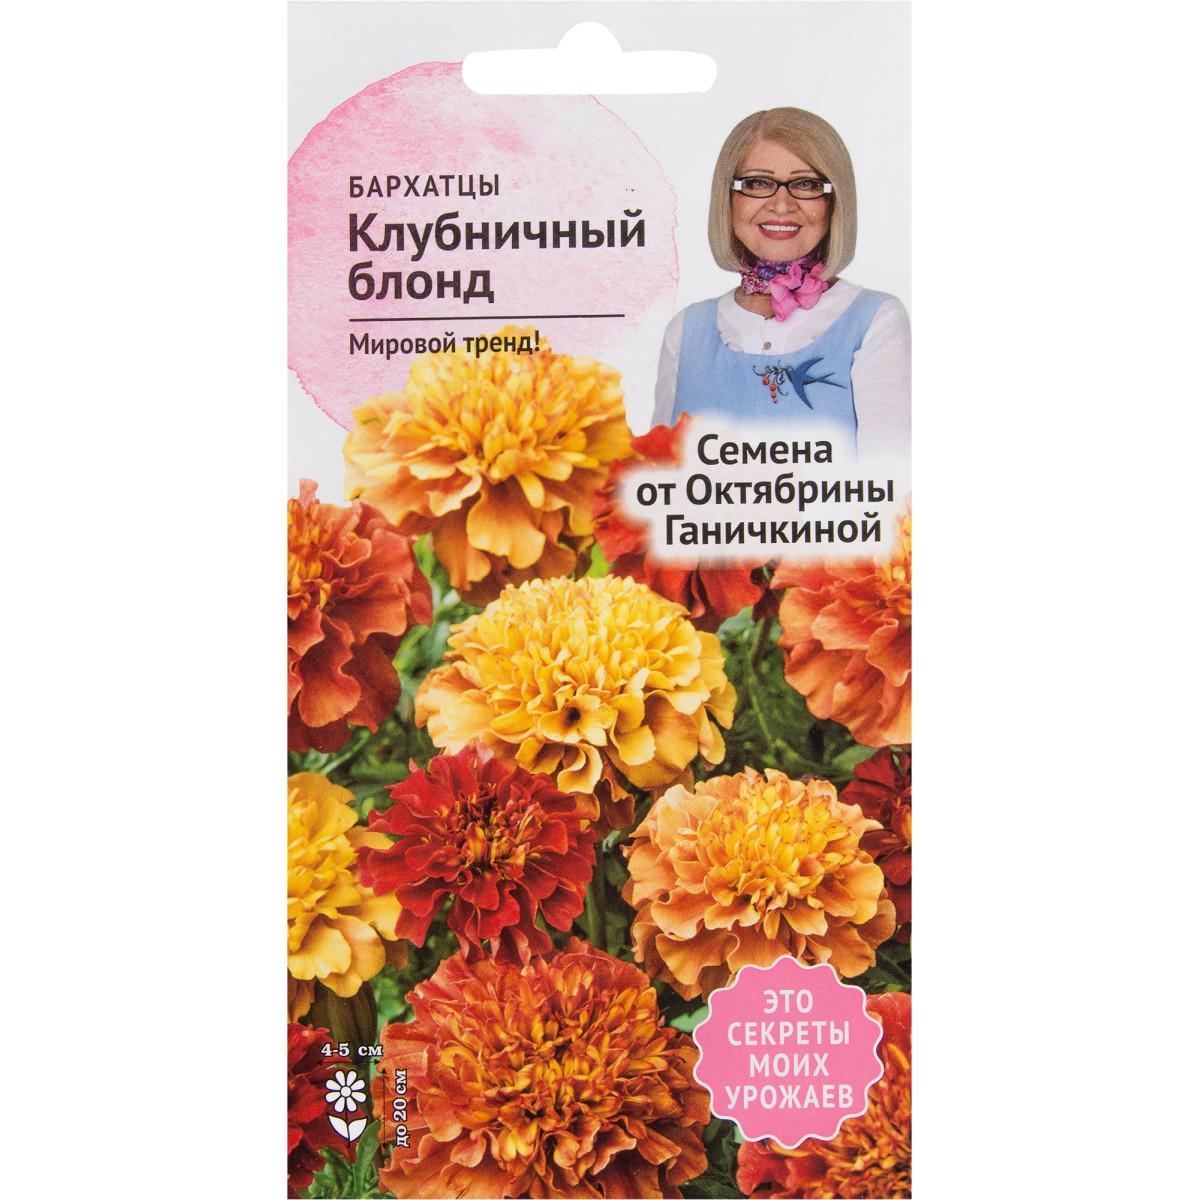 Бархатцы «Клубничный блонд» 10 шт.